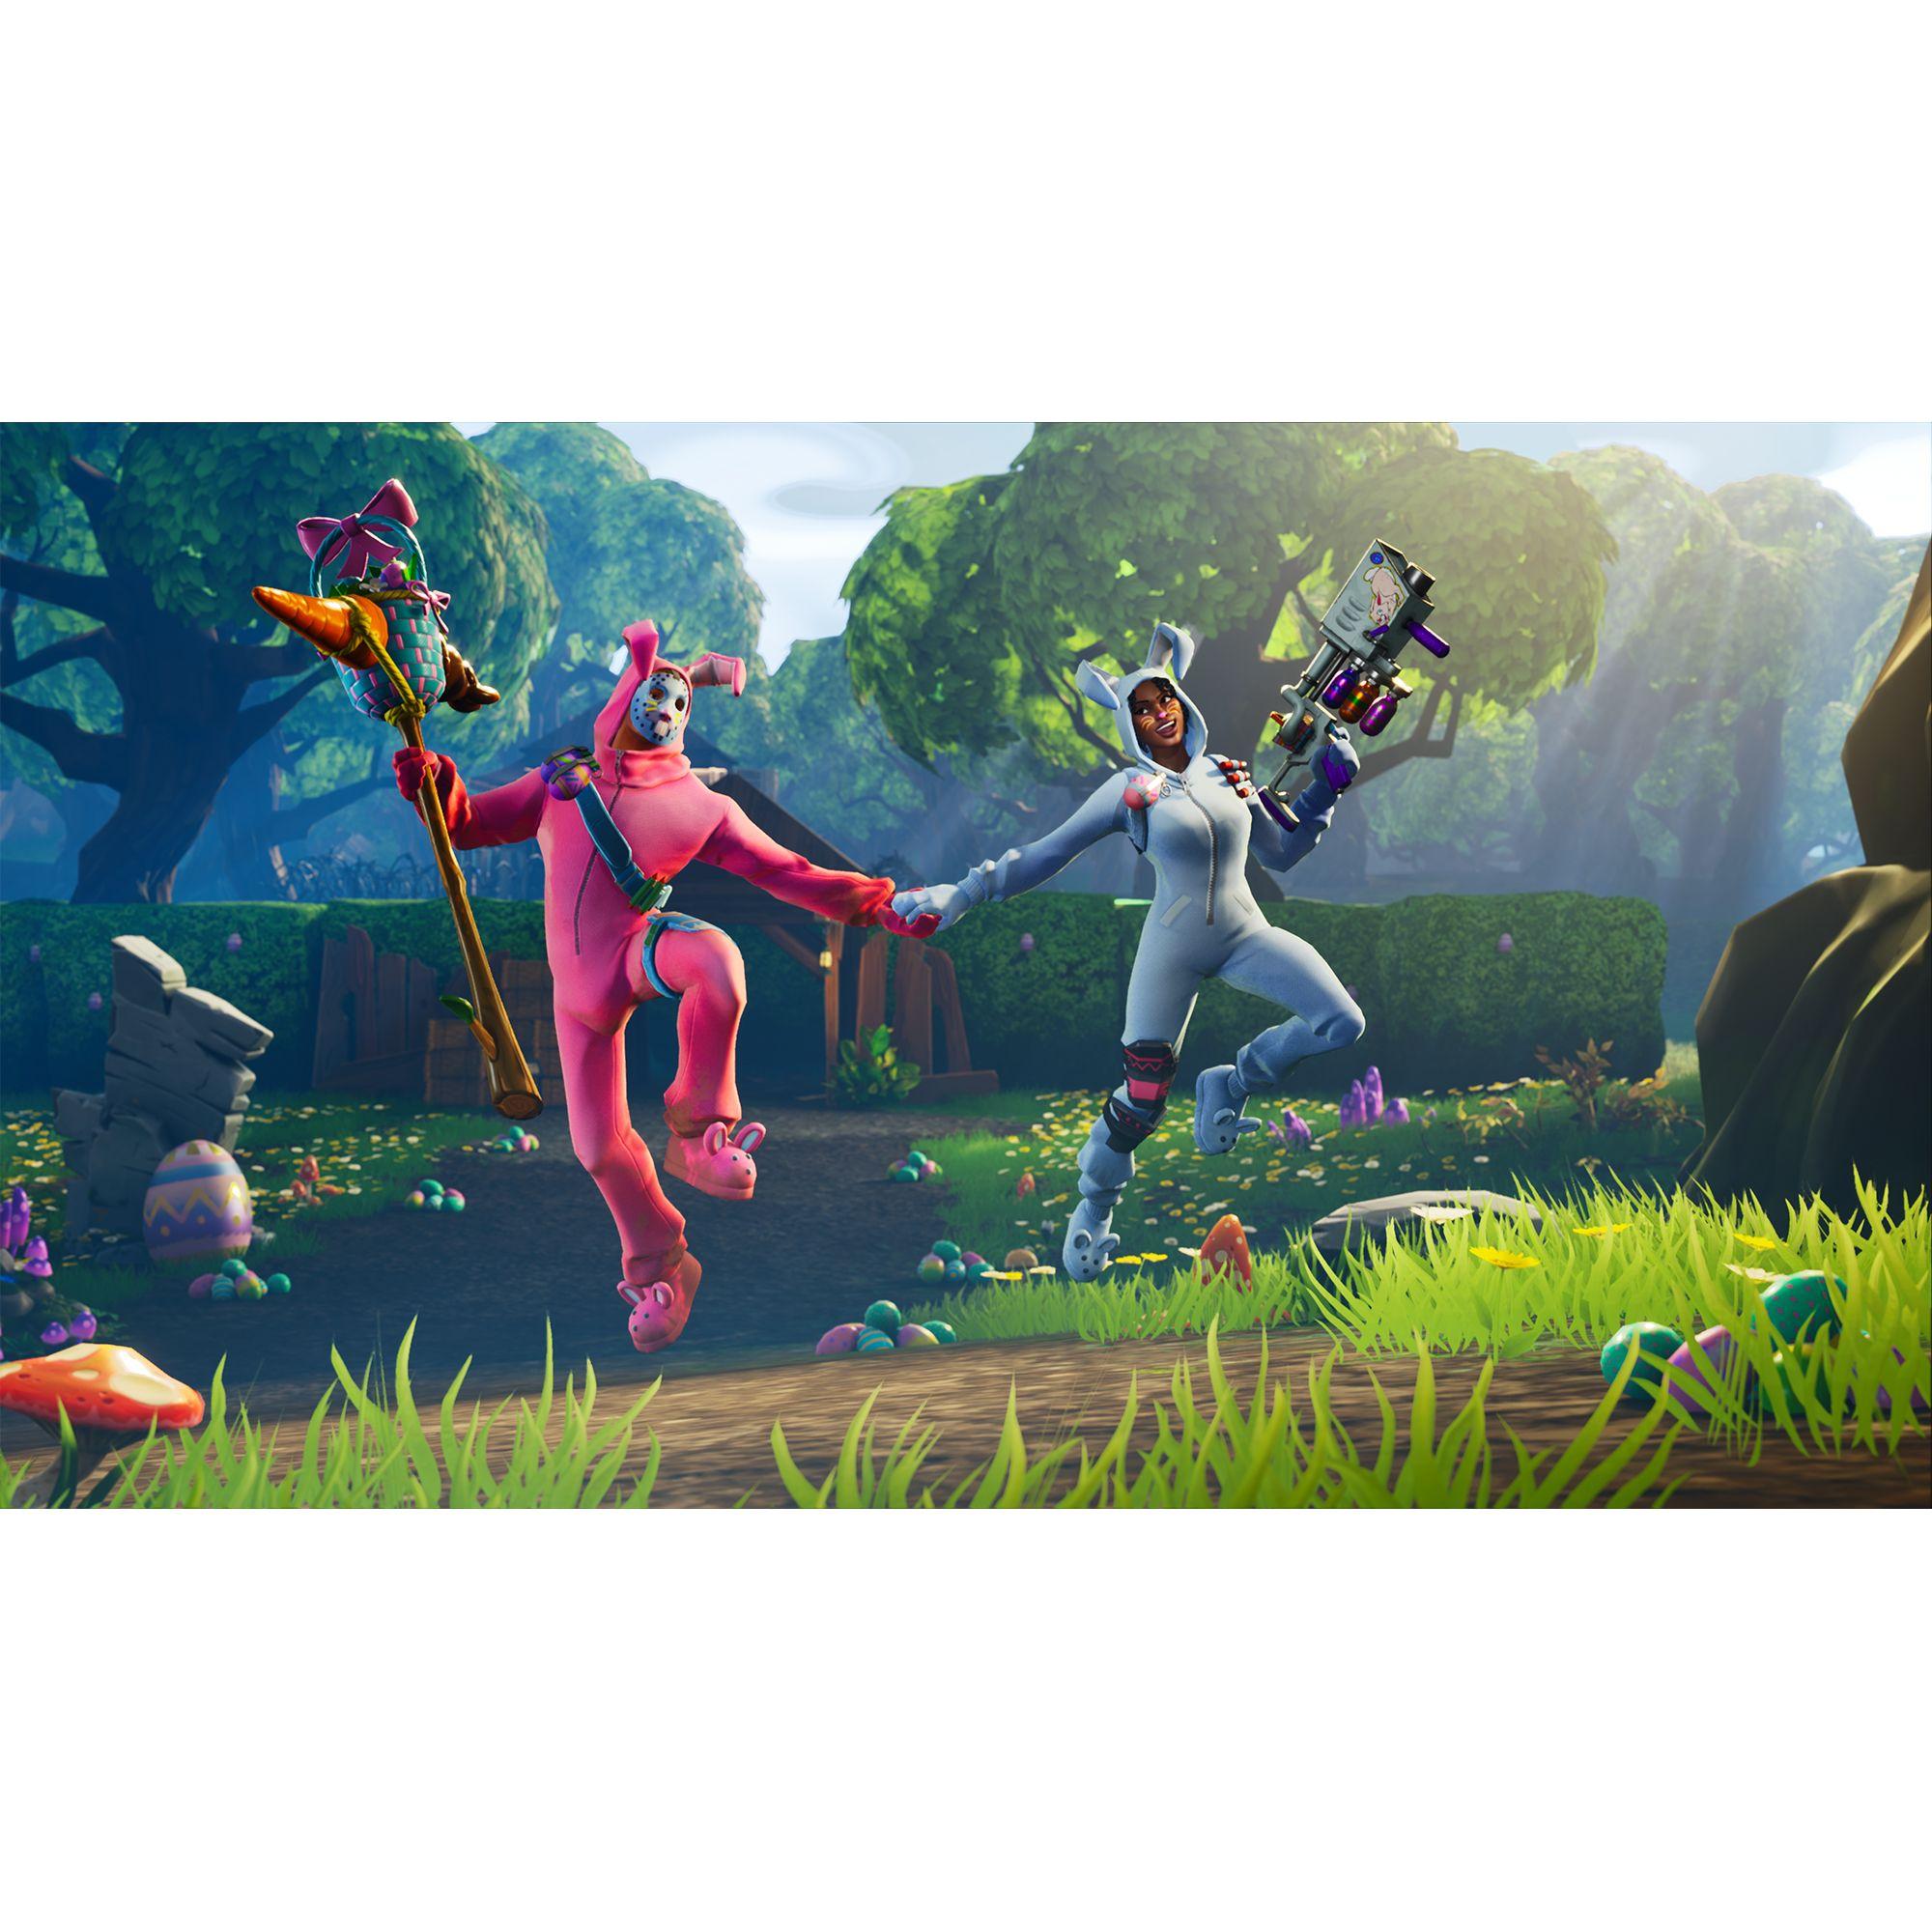 Microsoft Xbox One S 1tb Fortnite Bundle White 234 00703 Tb Fortnite Microsoft Fortnite Epic Games Fortnite Epic Games